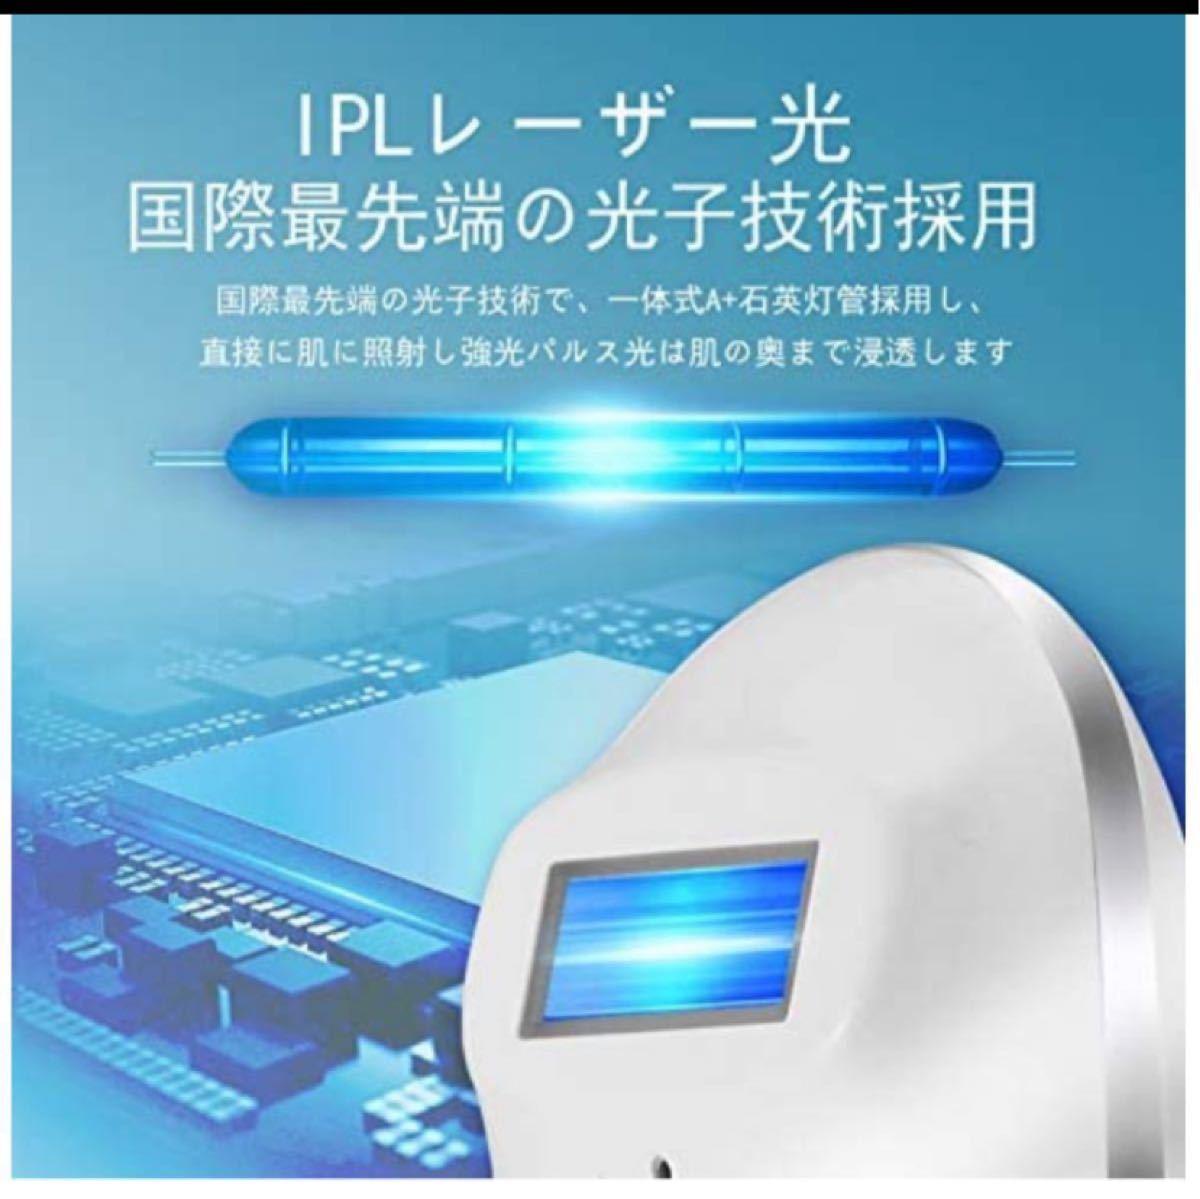 IPL光脱毛器 レーザー 永久脱毛 家庭用脱毛器 5段階調整 液晶LCD 全身用